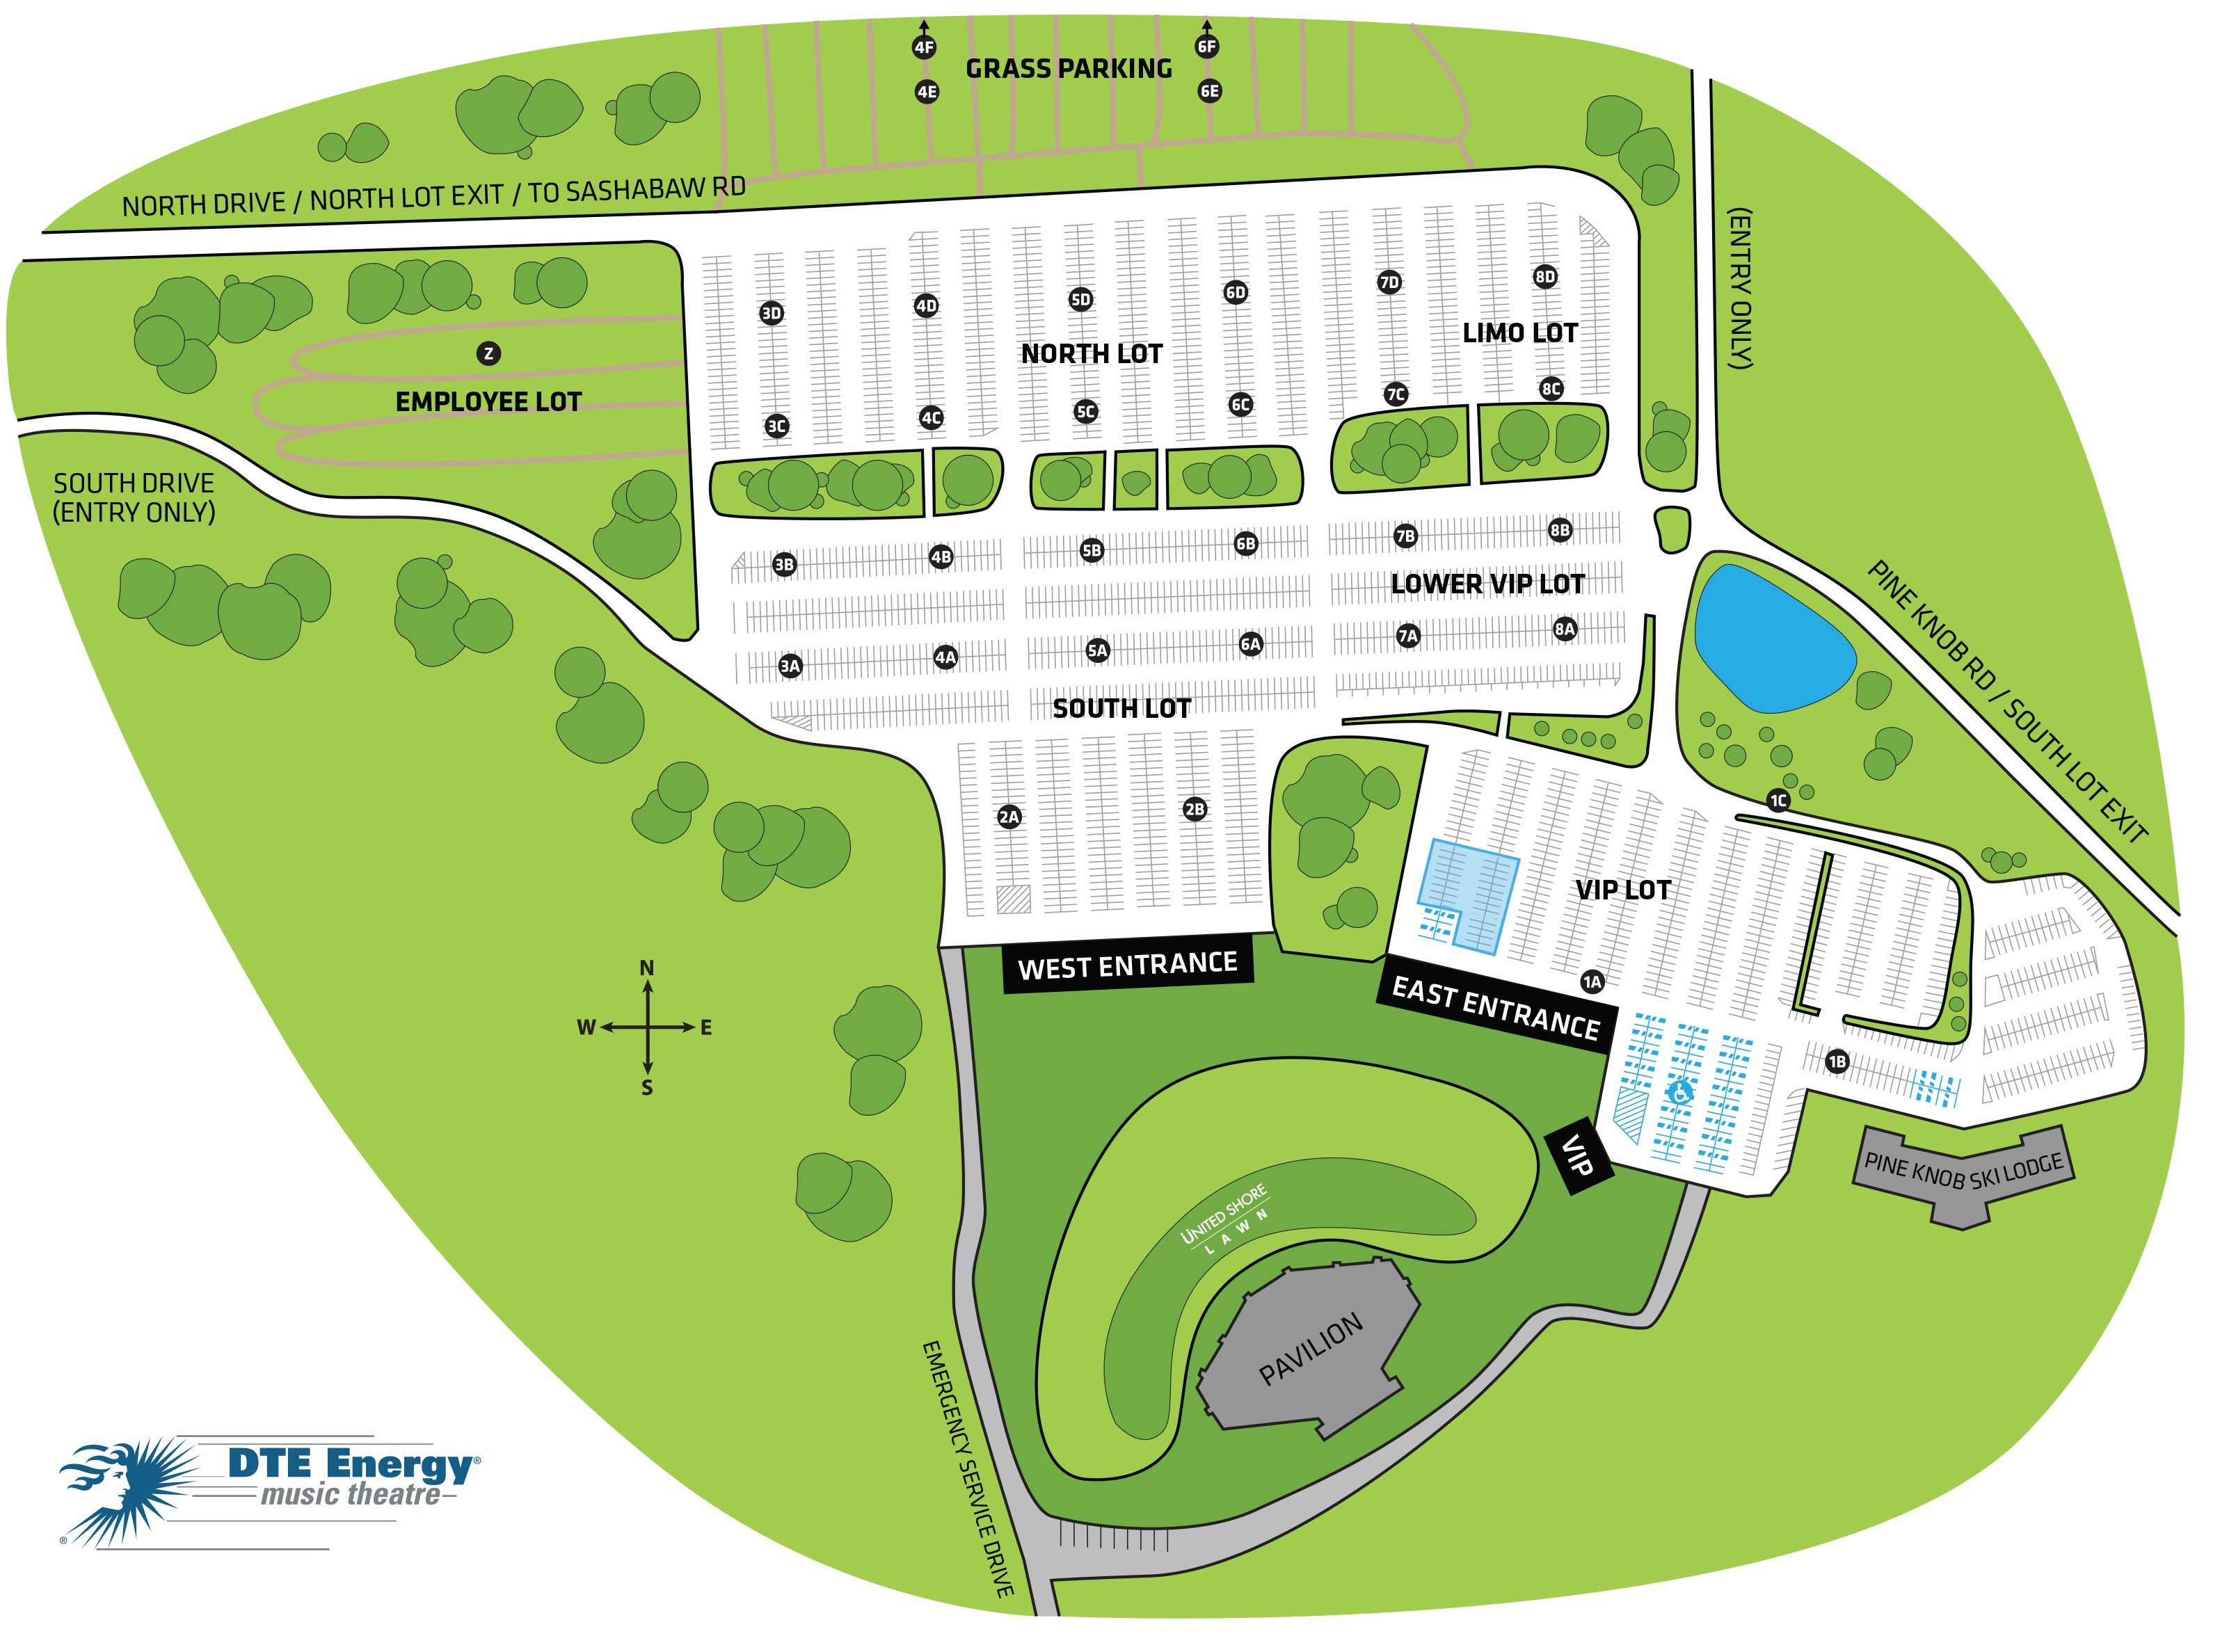 Dte Parking Map Public Spot Jpg